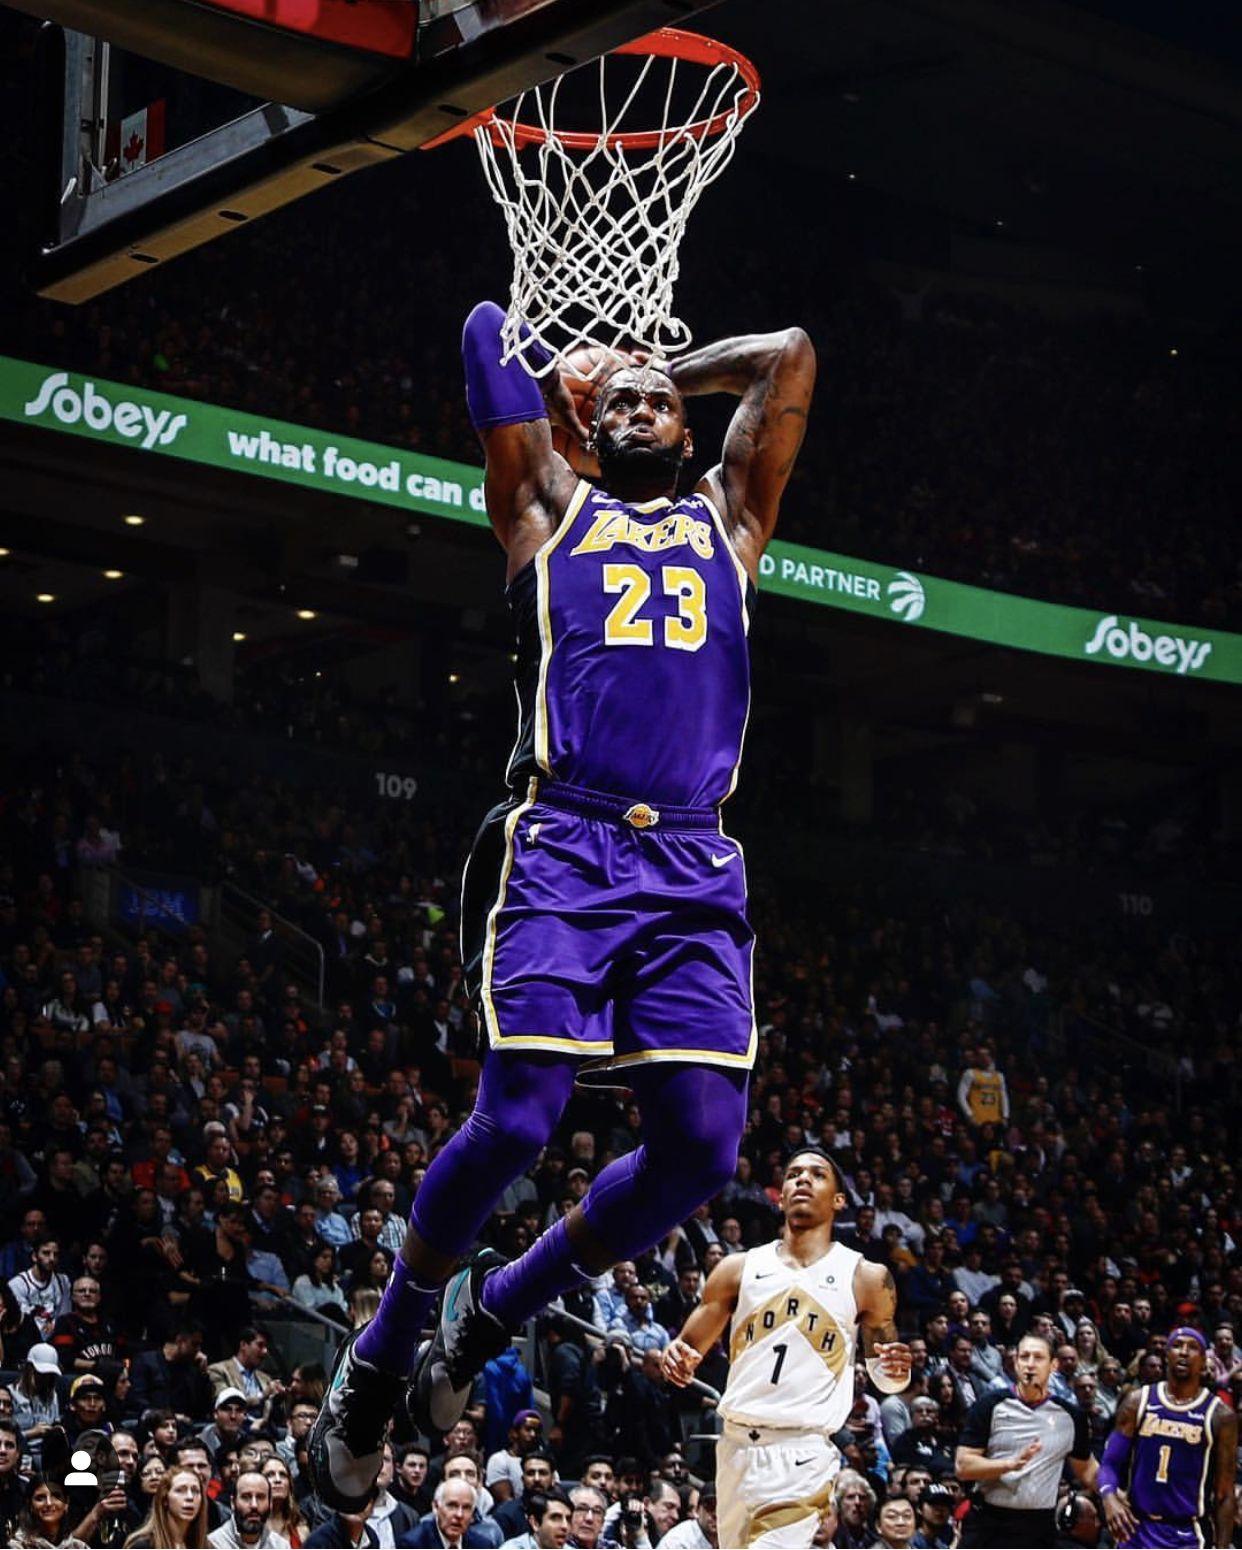 Pin By Levi Bechtle On Nba Lebron James La Lakers Sports Basketball